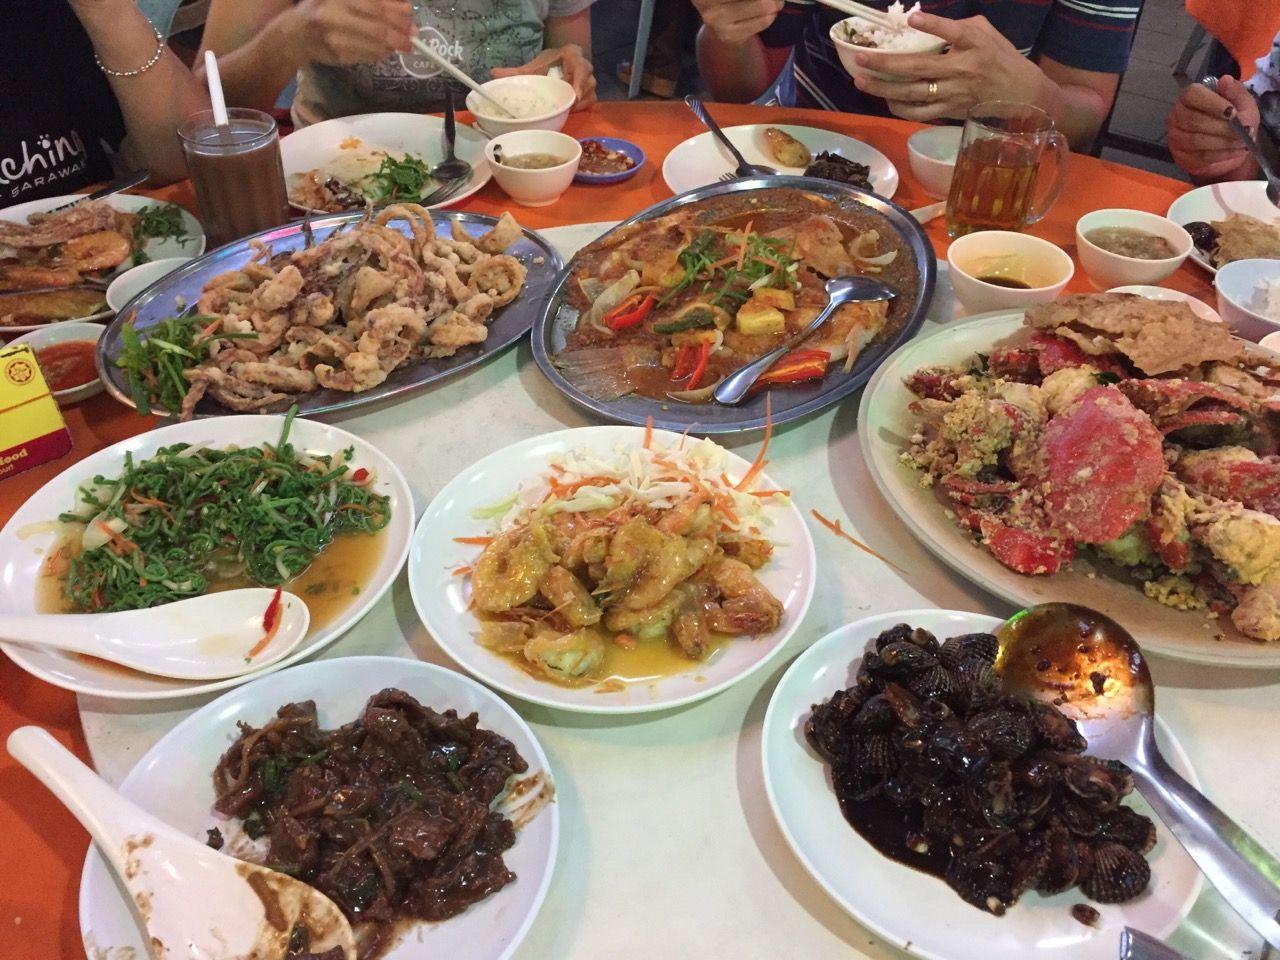 I ate a casual malaysian seafood dinner httpift2gz6gwp i ate a casual malaysian seafood dinner httpift seafood dinnerawesome foodcasualcooking forumfinder Choice Image